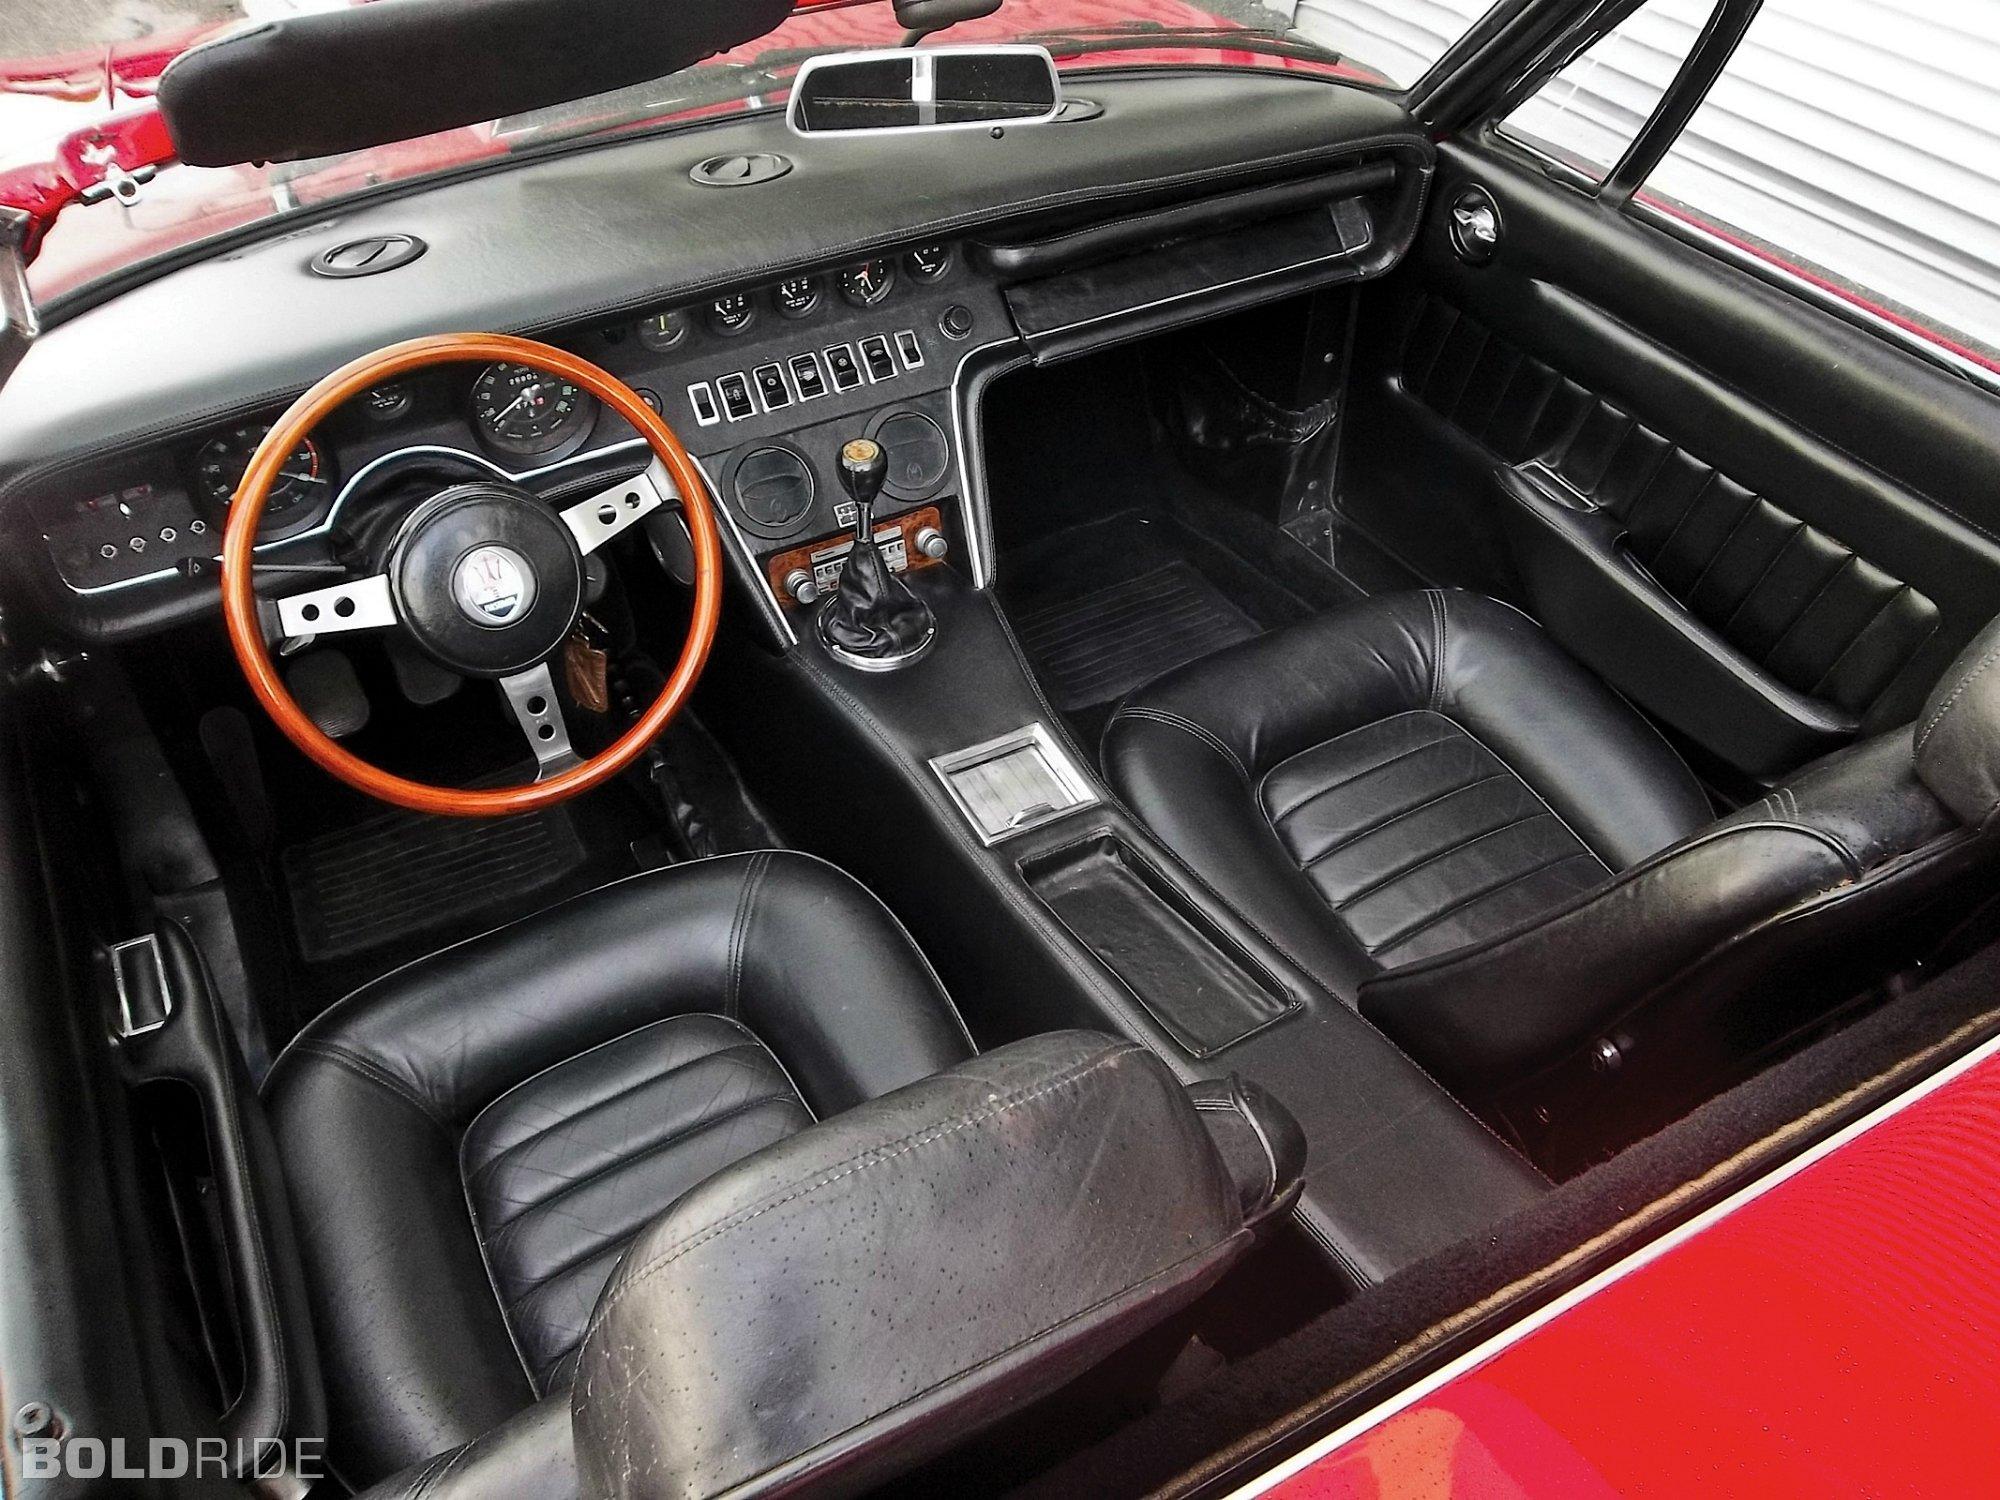 maserati ghibli spider spyder cars supercars classic. Black Bedroom Furniture Sets. Home Design Ideas